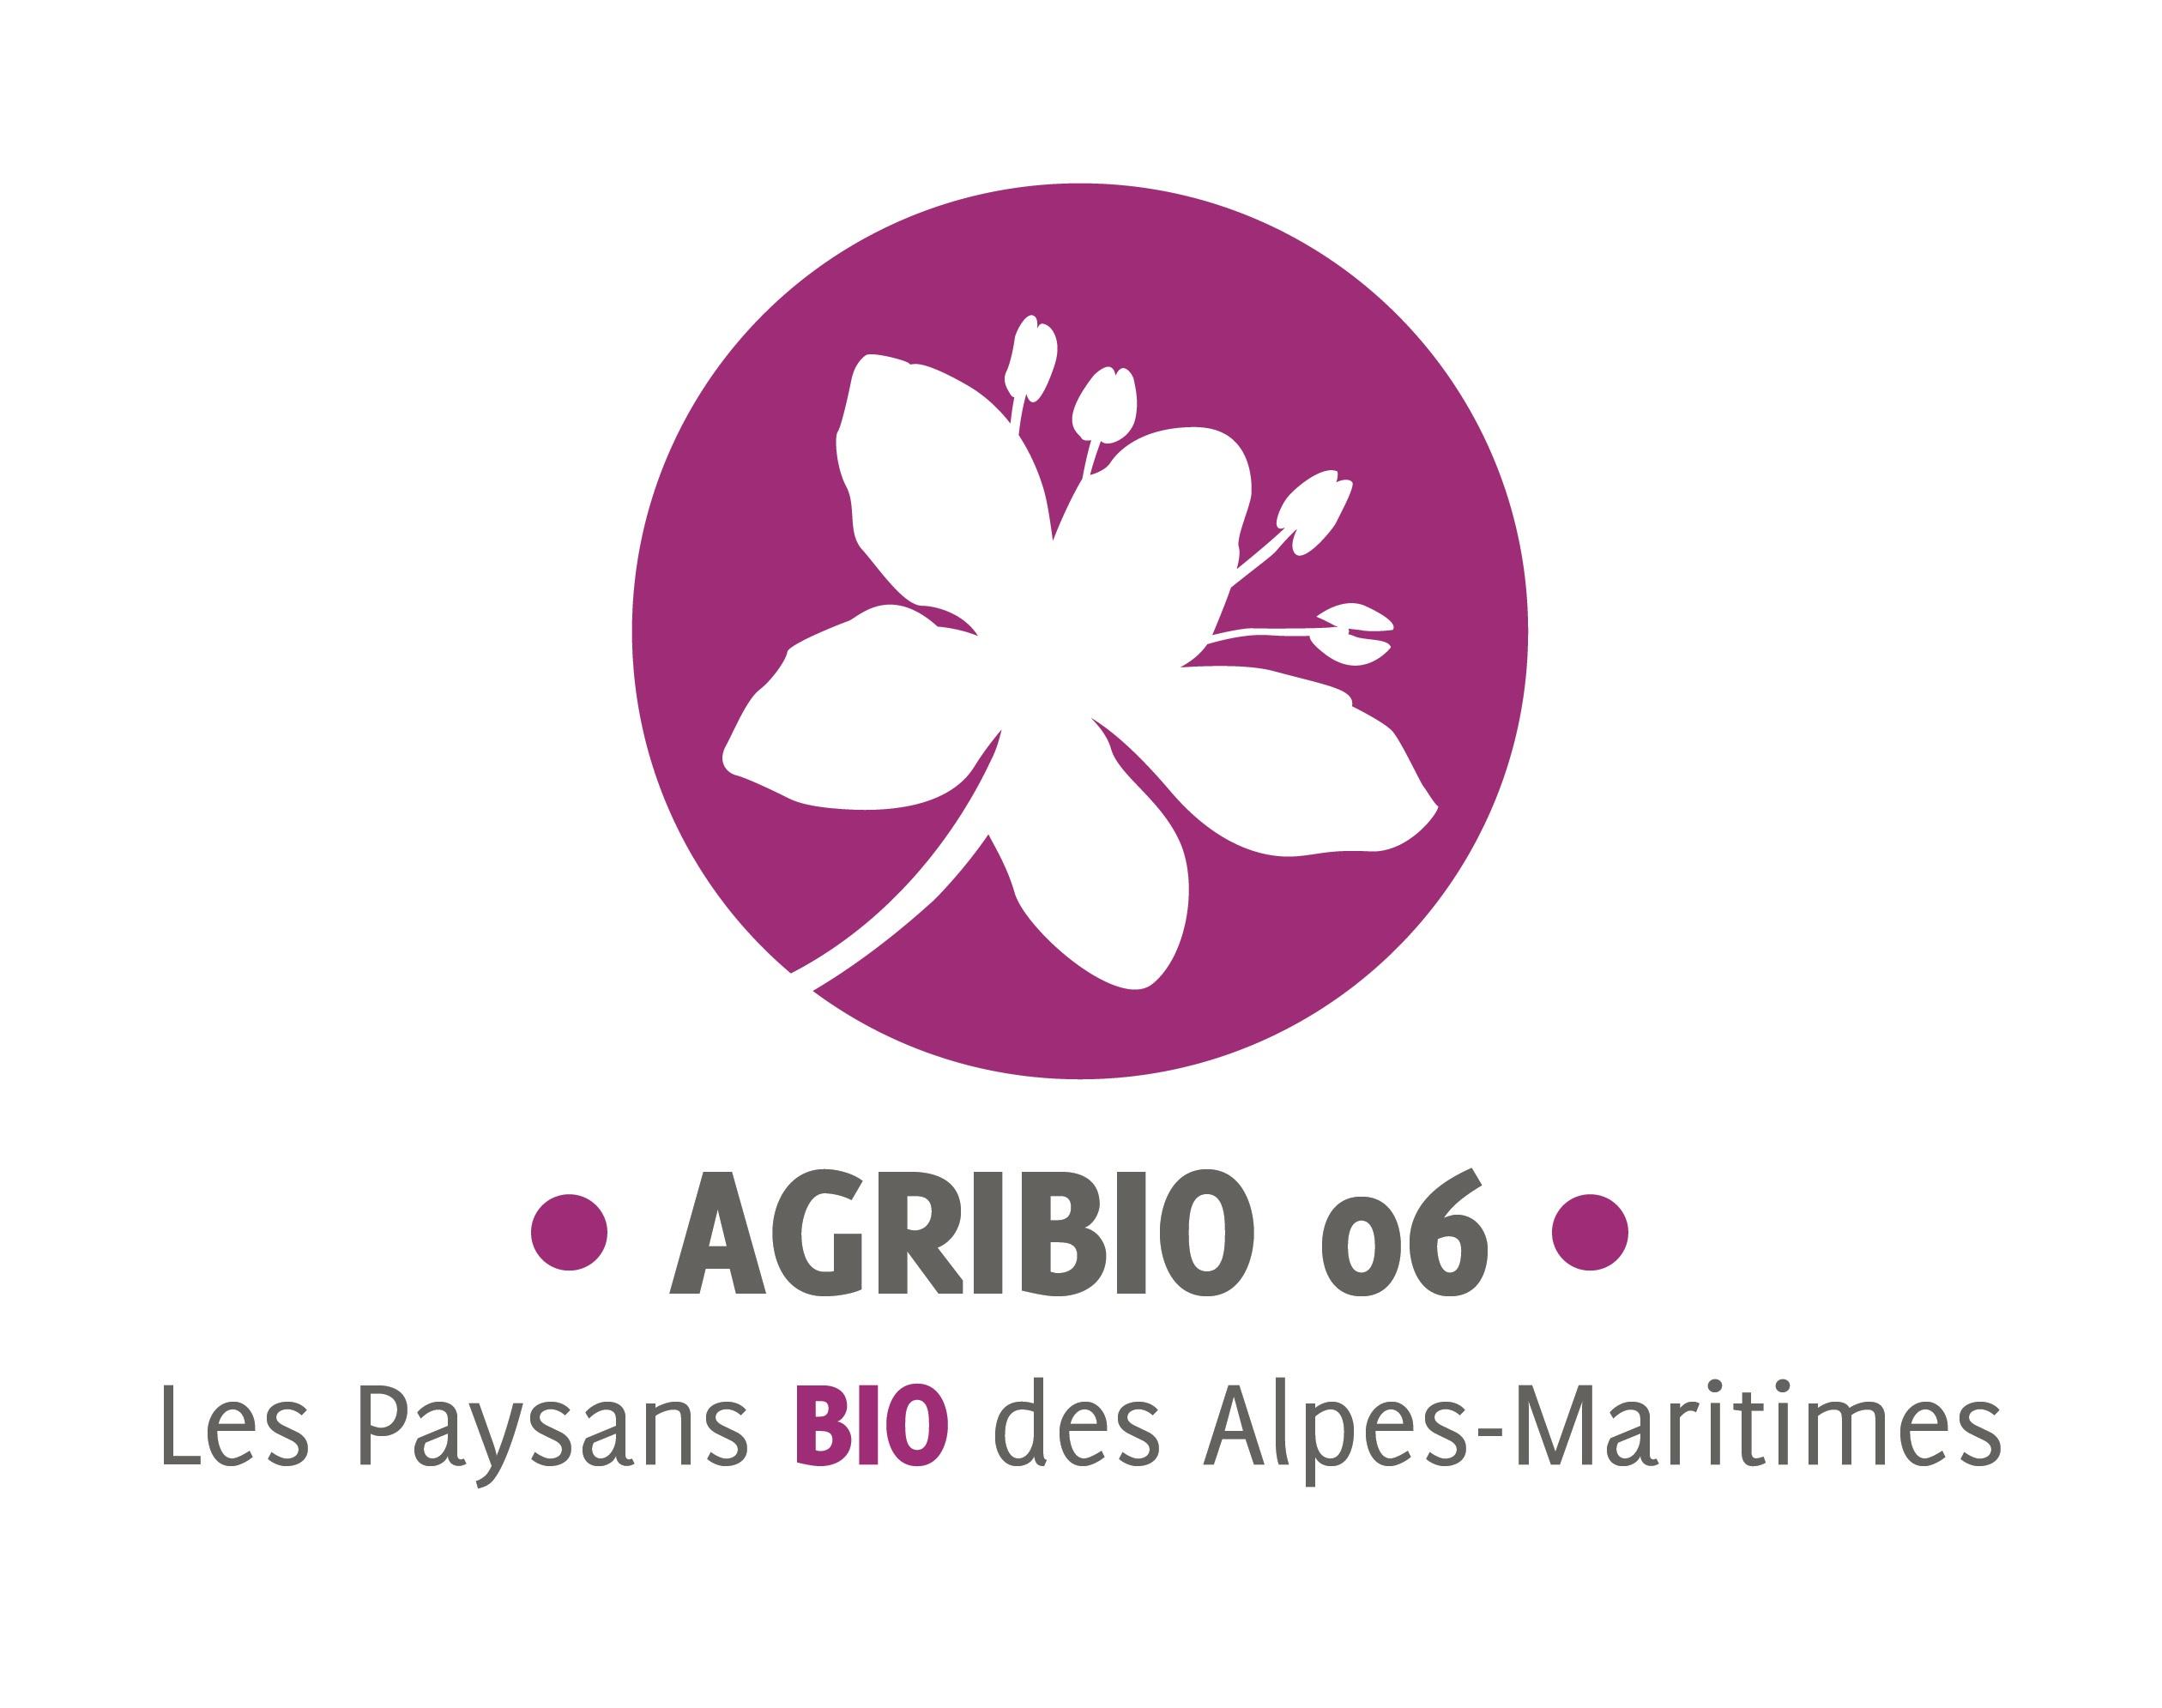 Agribio 06